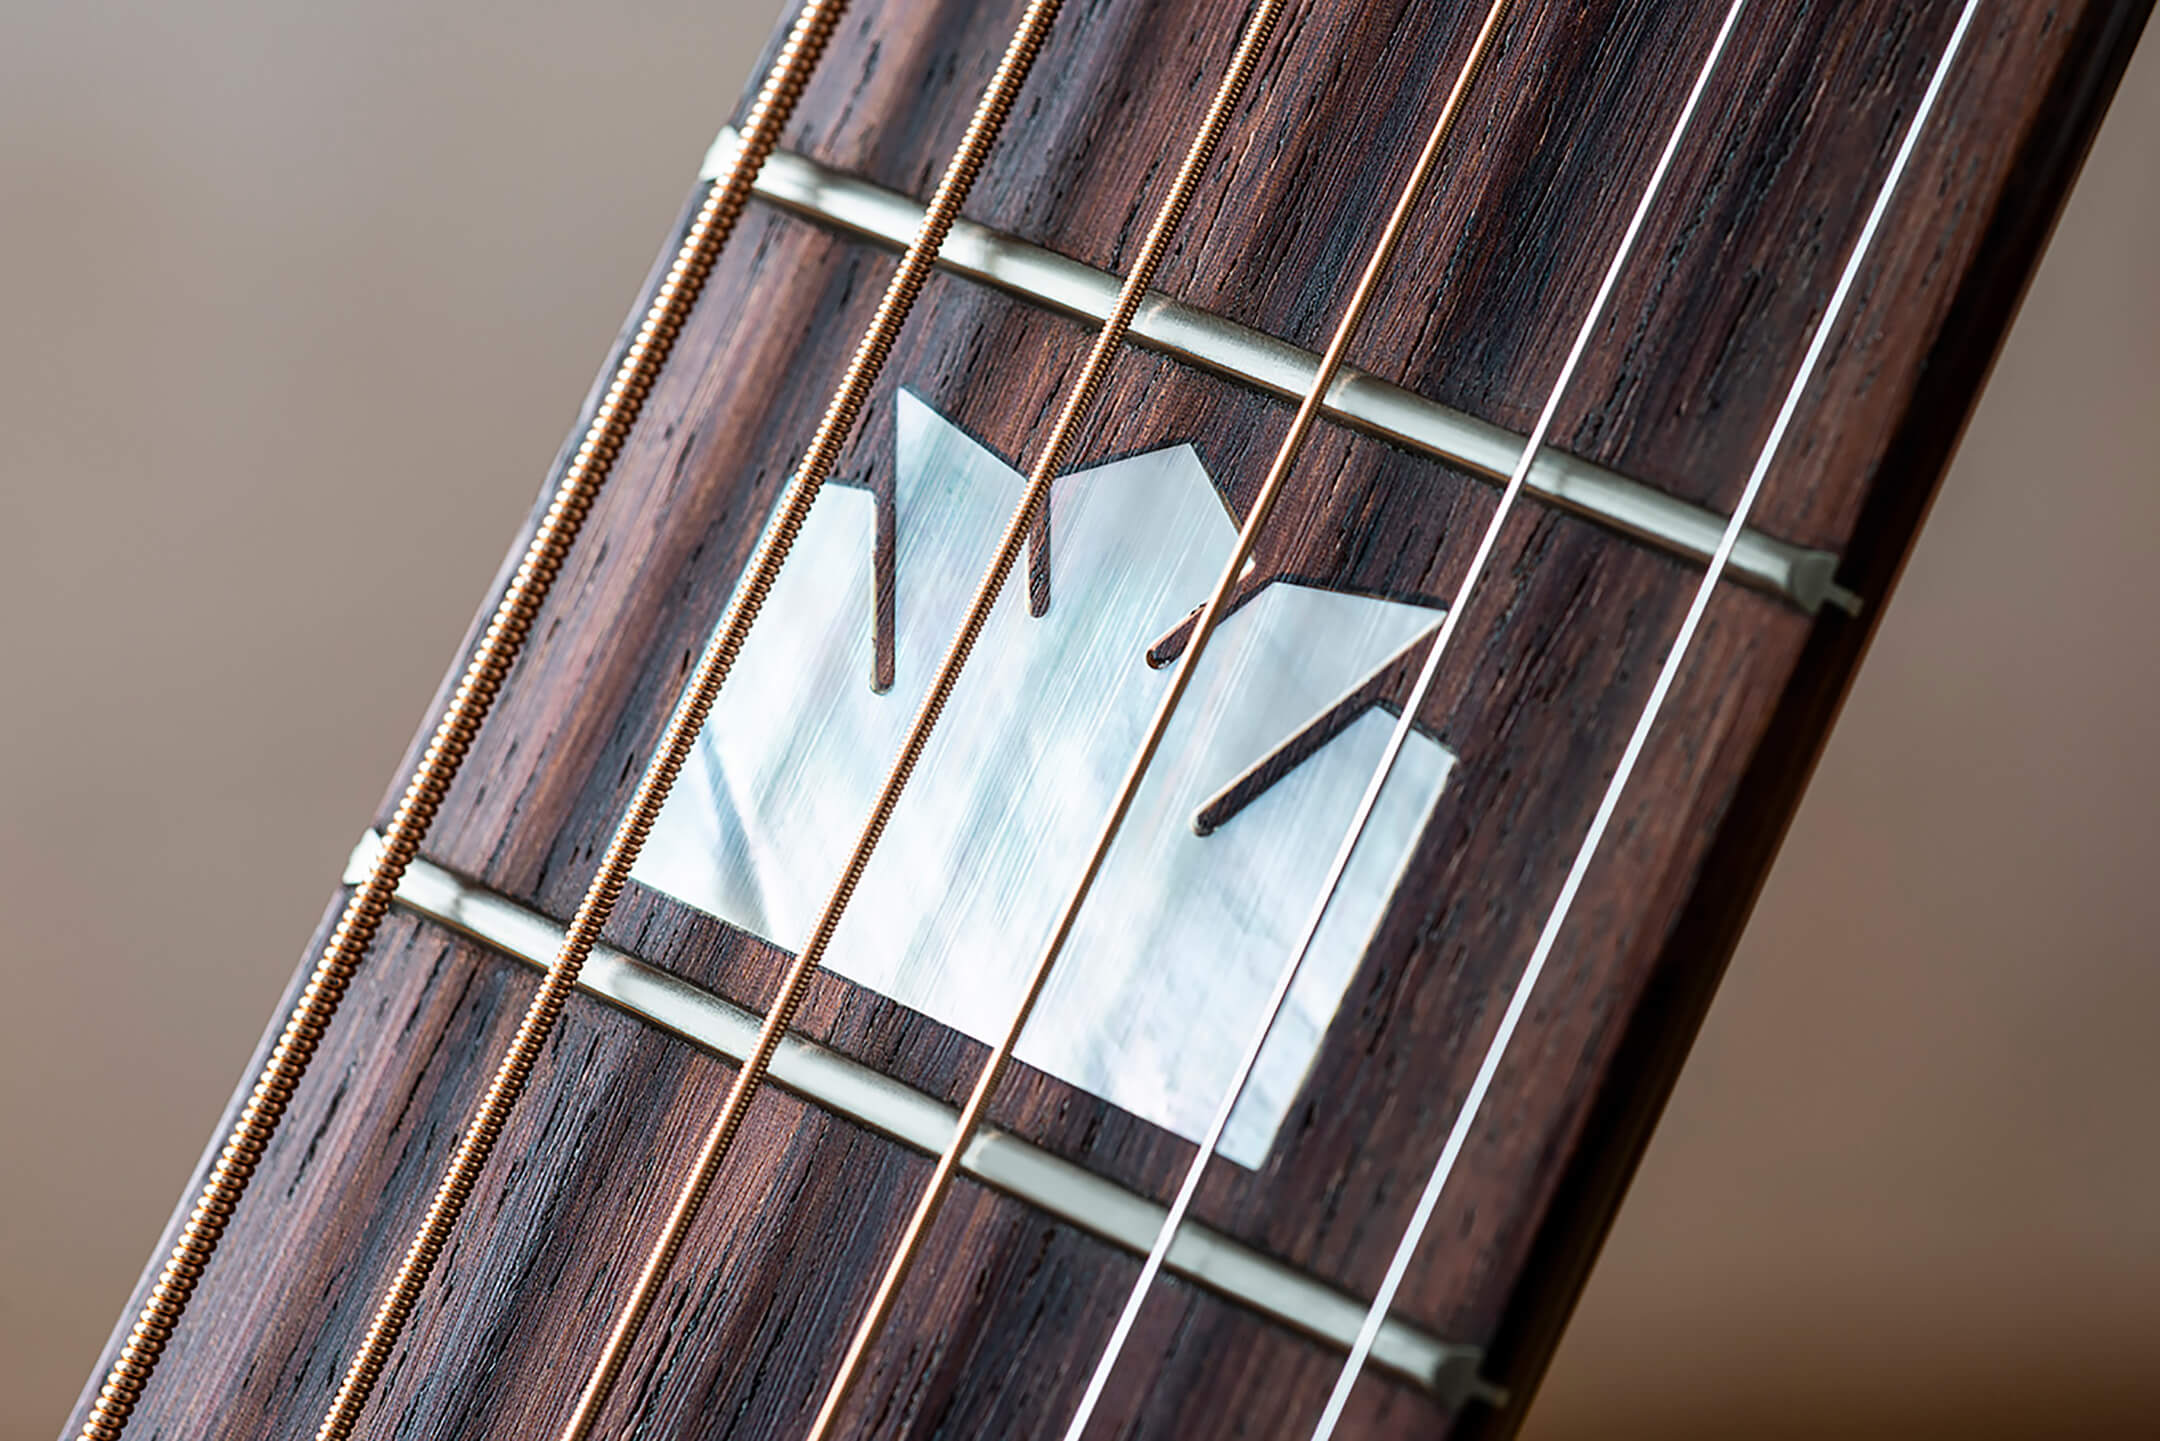 Noel Gallagher's Gibson J-150